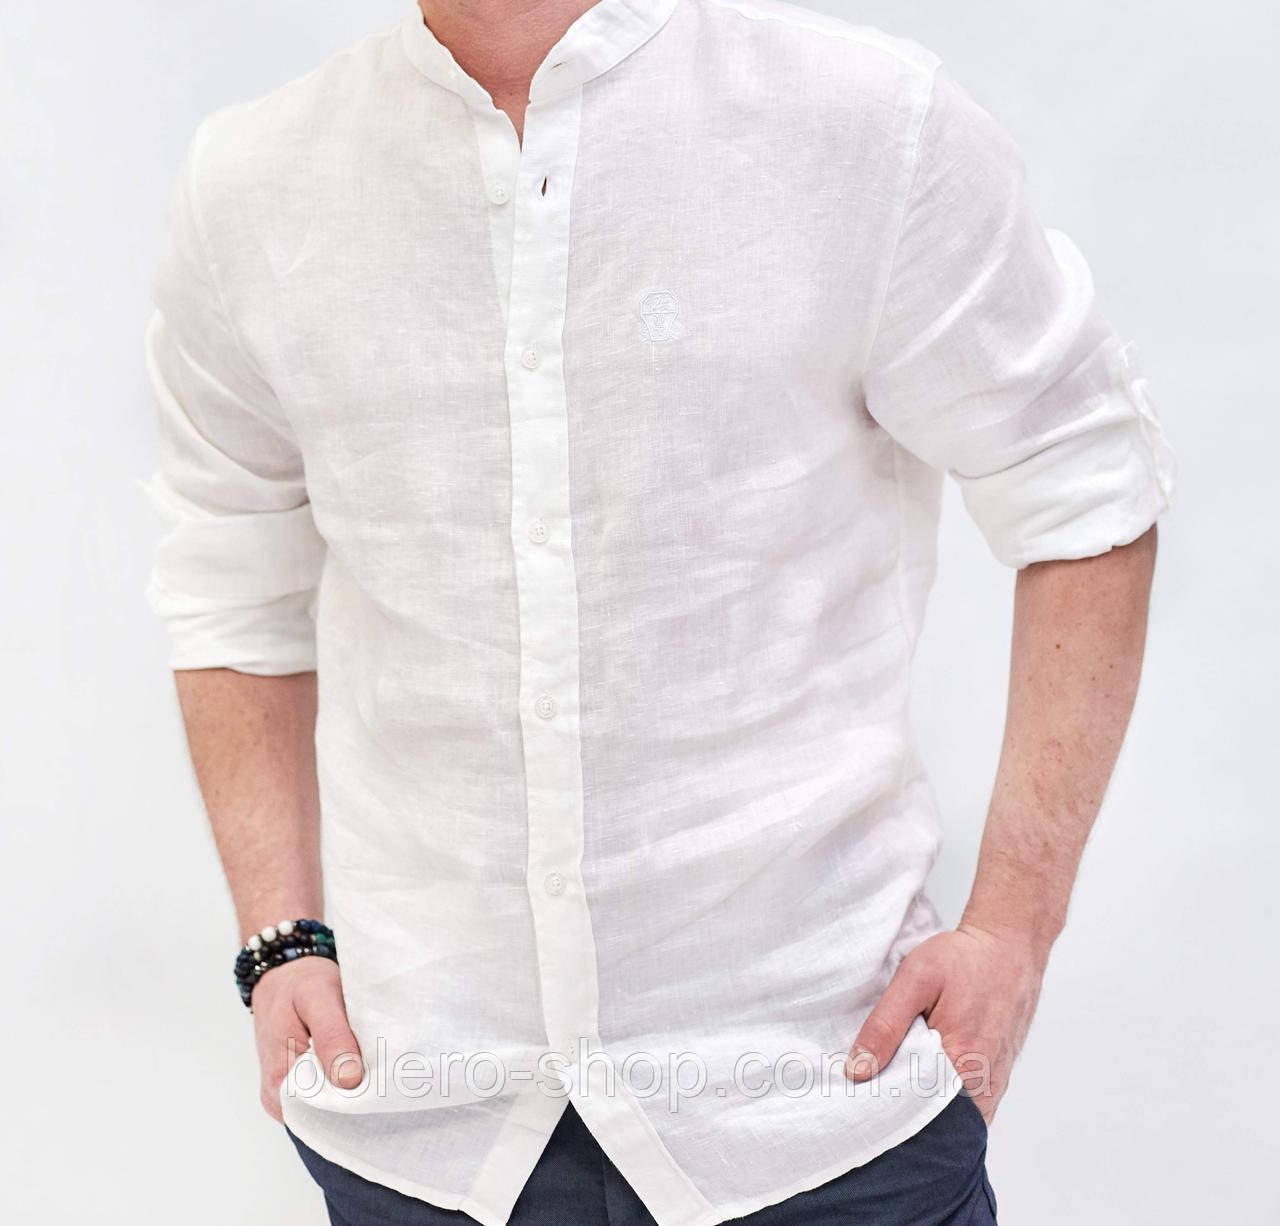 Рубашка мужская белая Лен  Brunello Cucinelli  3XL